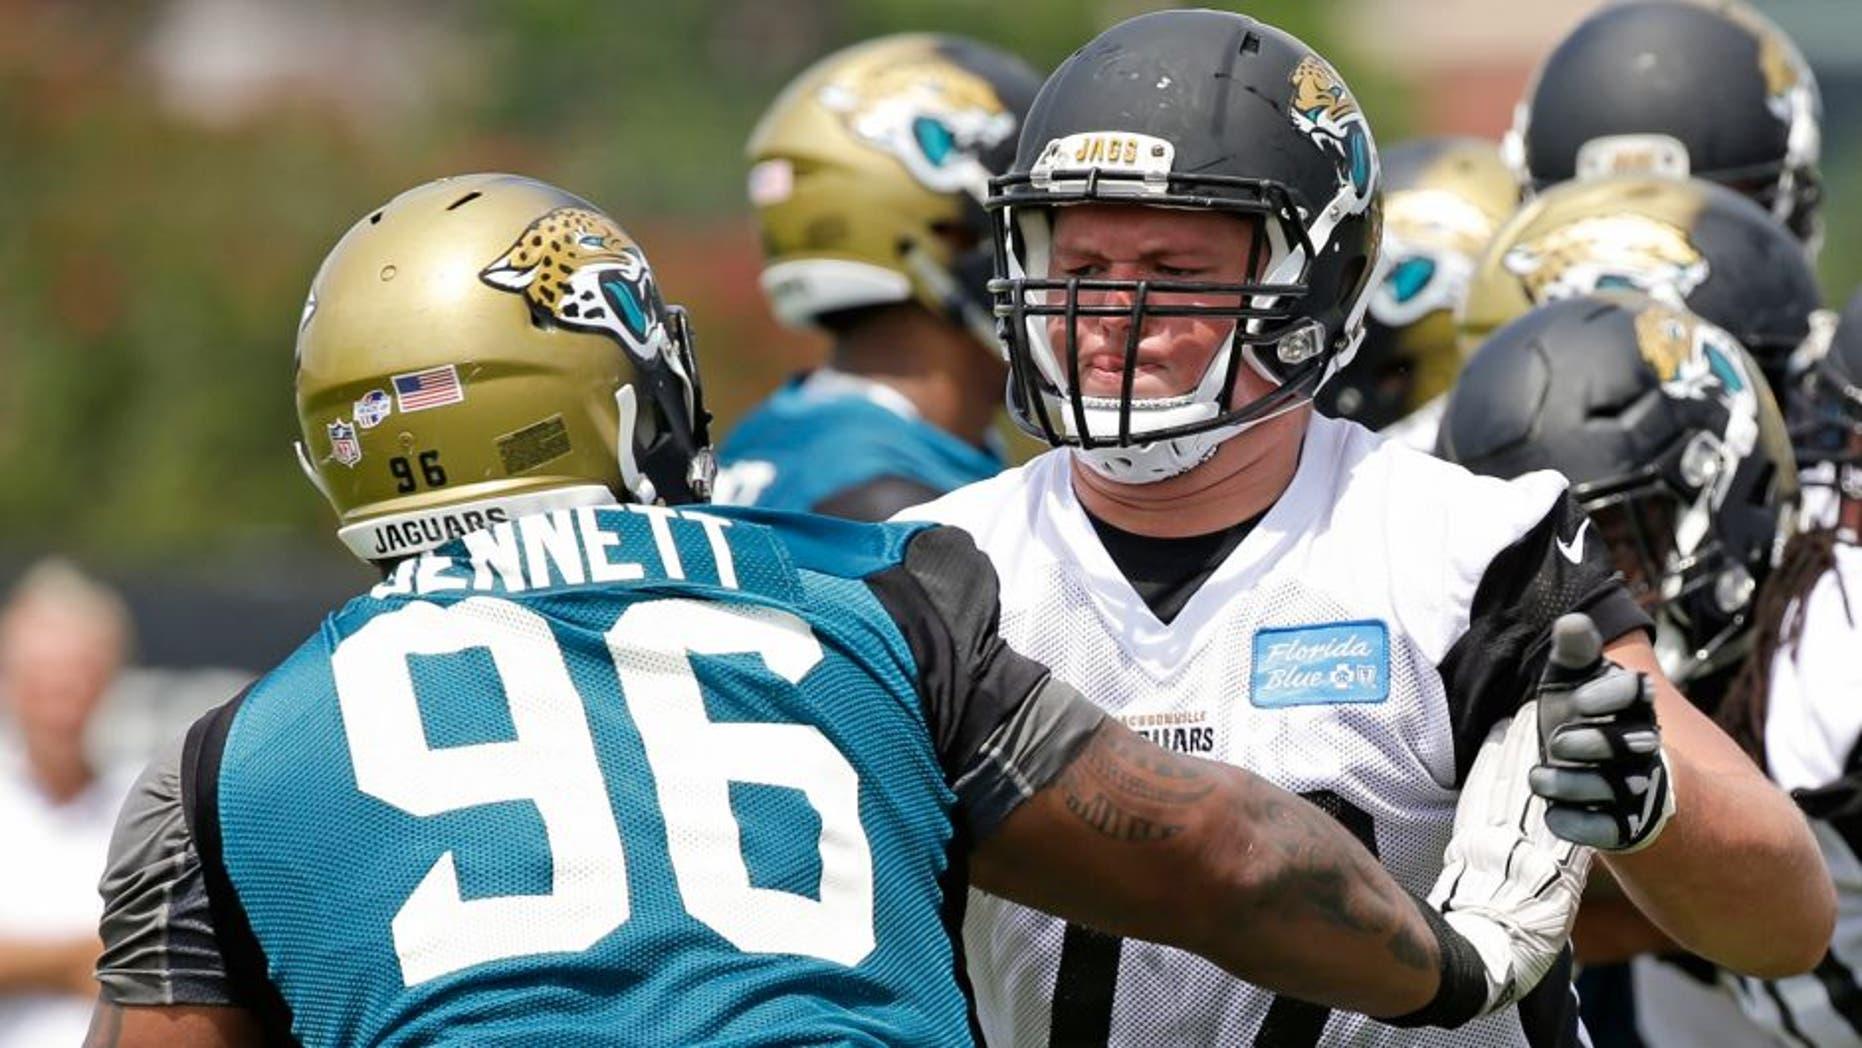 Jacksonville Jaguars tackle Josh Wells (72) blocks defensive tackle Michael Bennett (96) during a light scrimmage at NFL football training camp, Friday, July 31, 2015, in Jacksonville, Fla. (AP Photo/John Raoux)